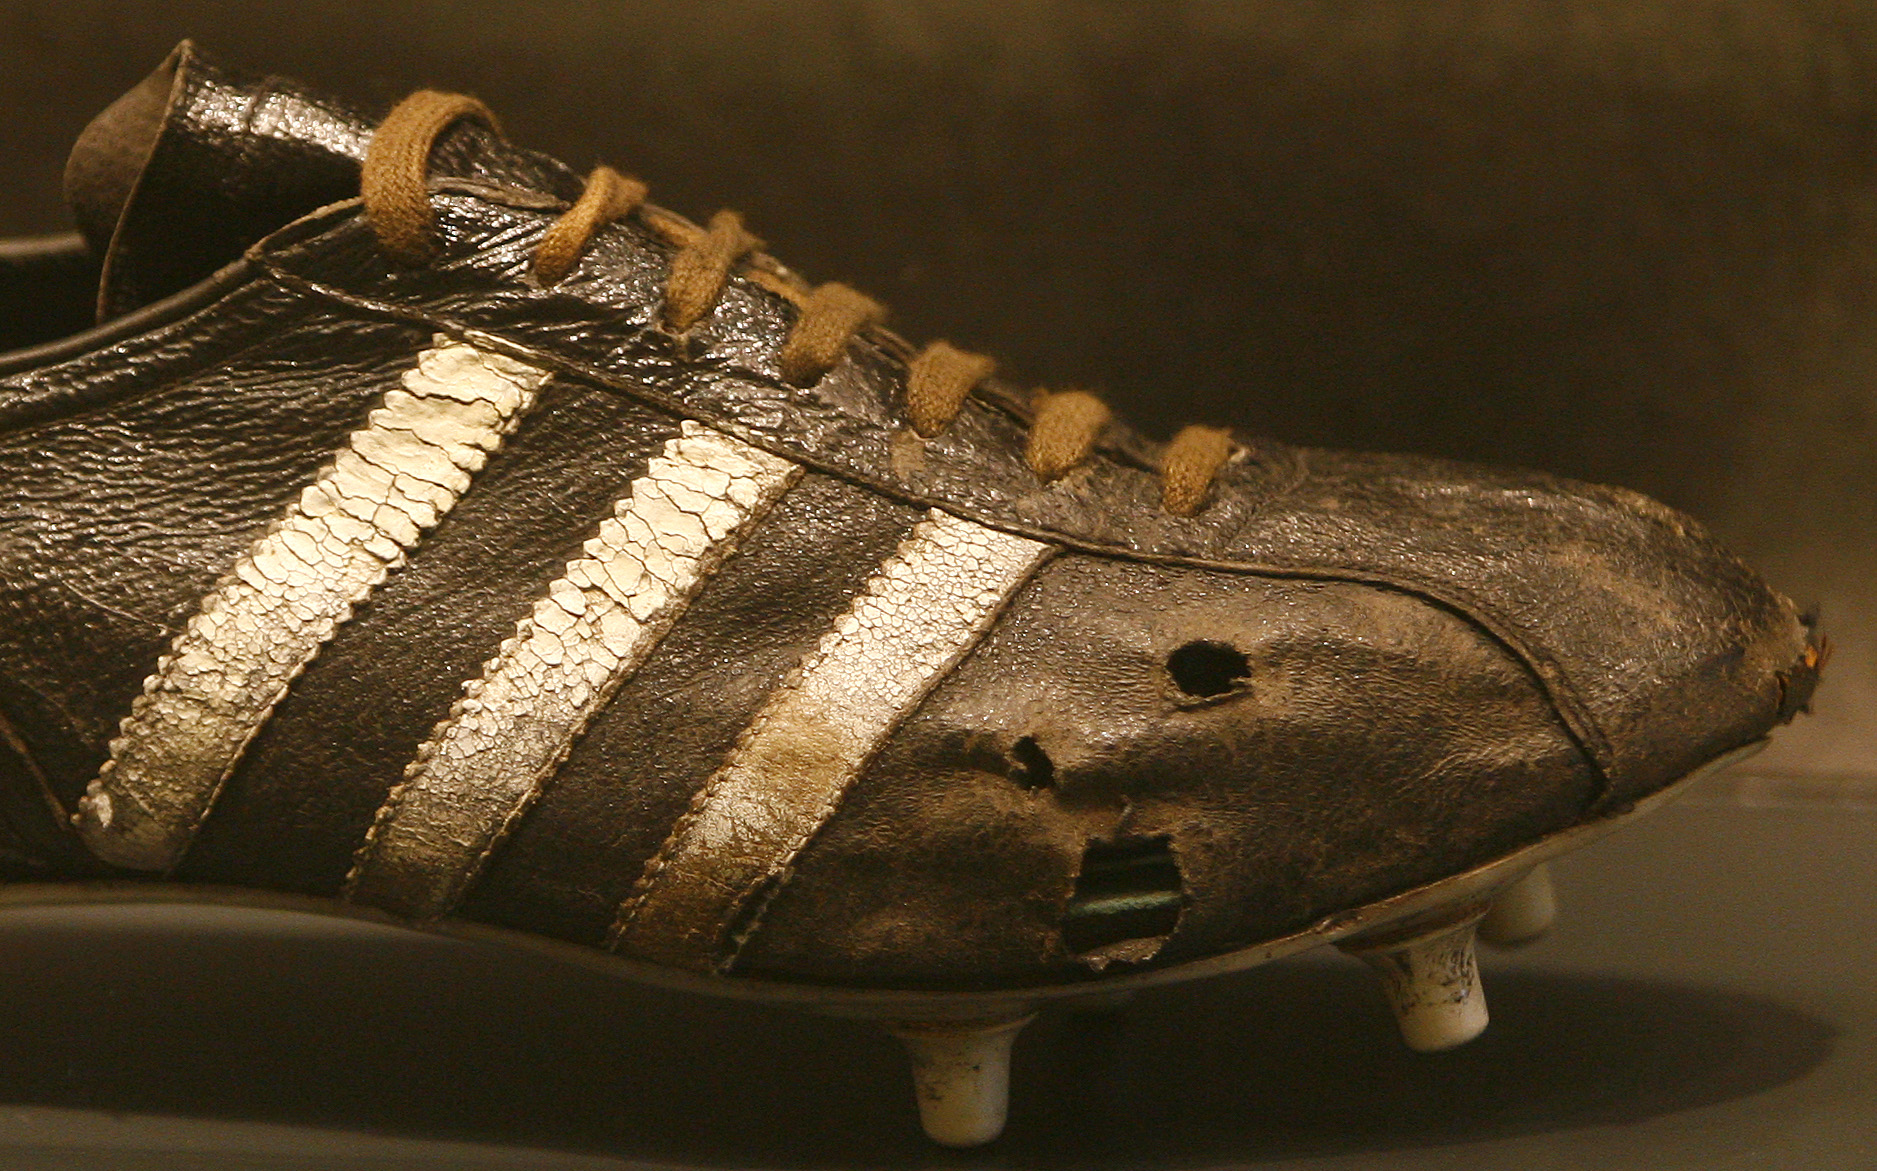 Adidas has sued pretty much everyone who has used stripes